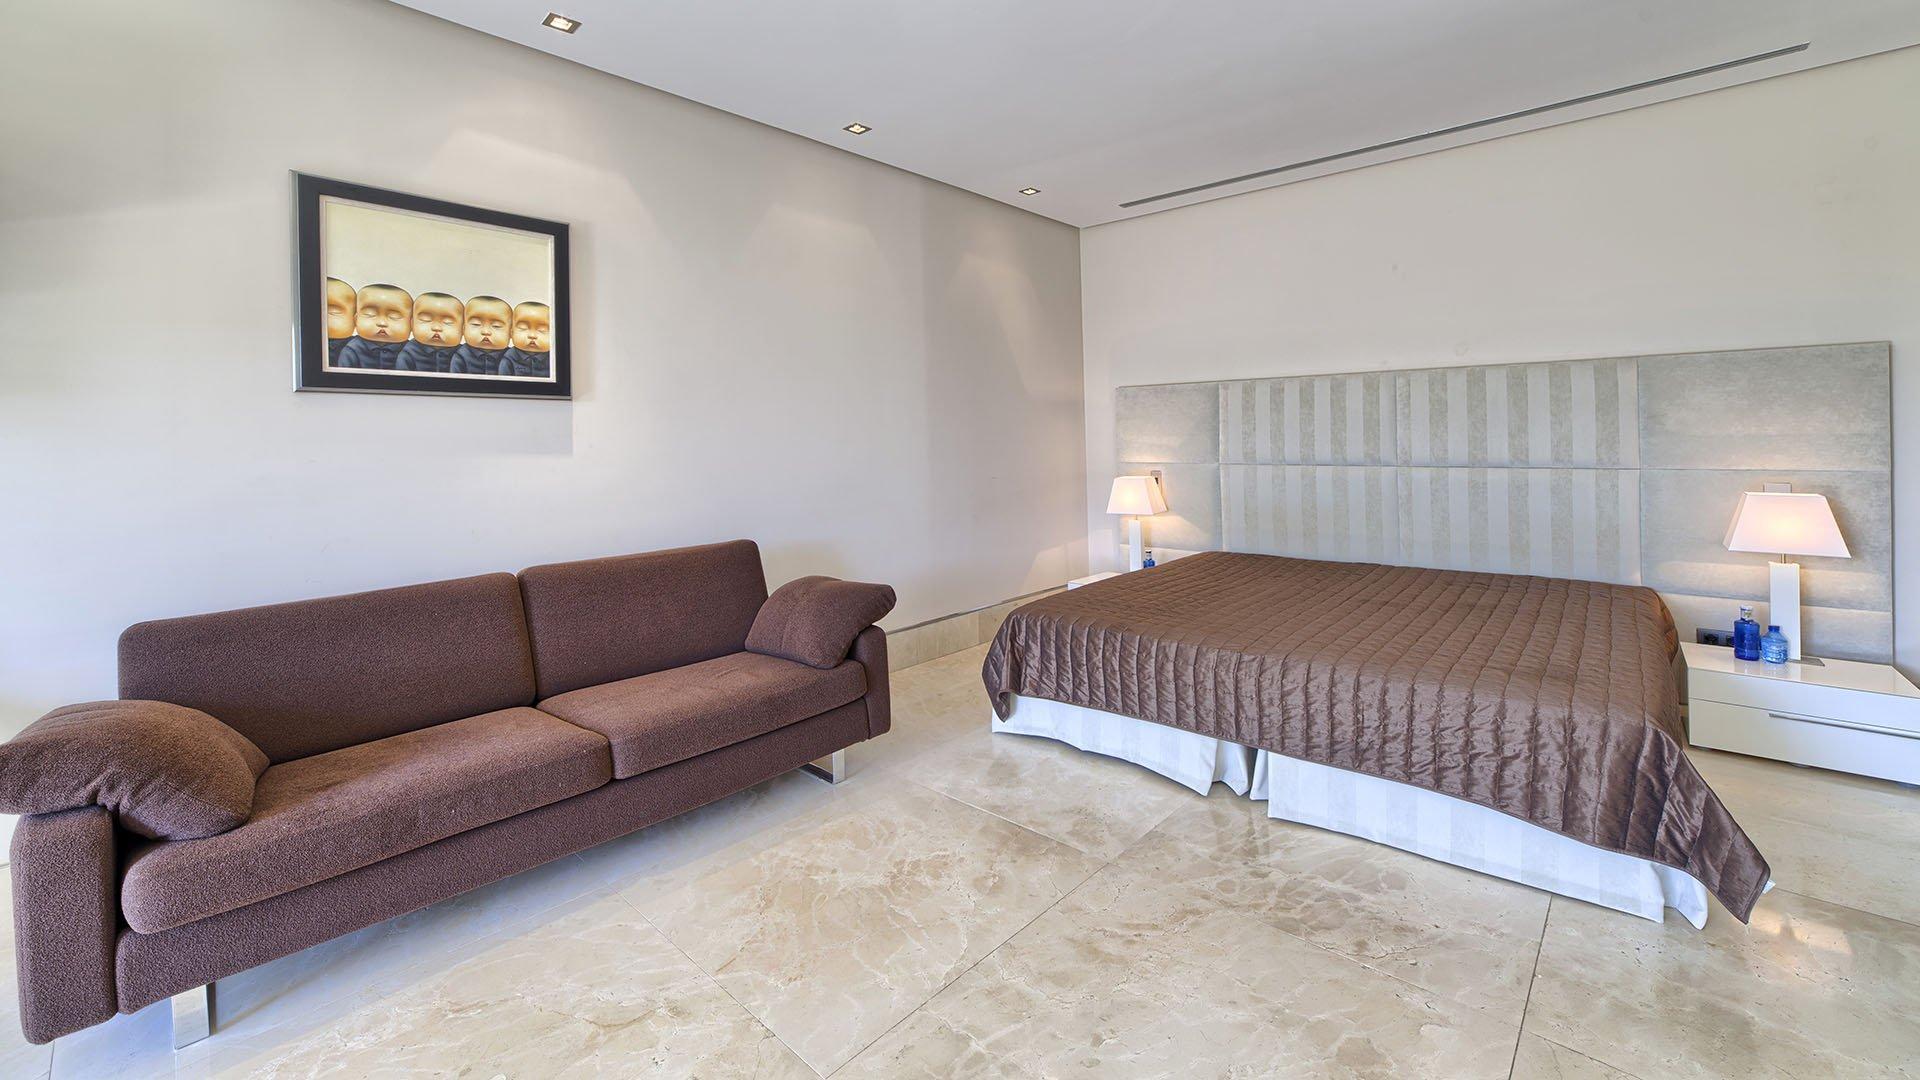 Villa La Zagaleta F1-30: Sensational villa with stunning views